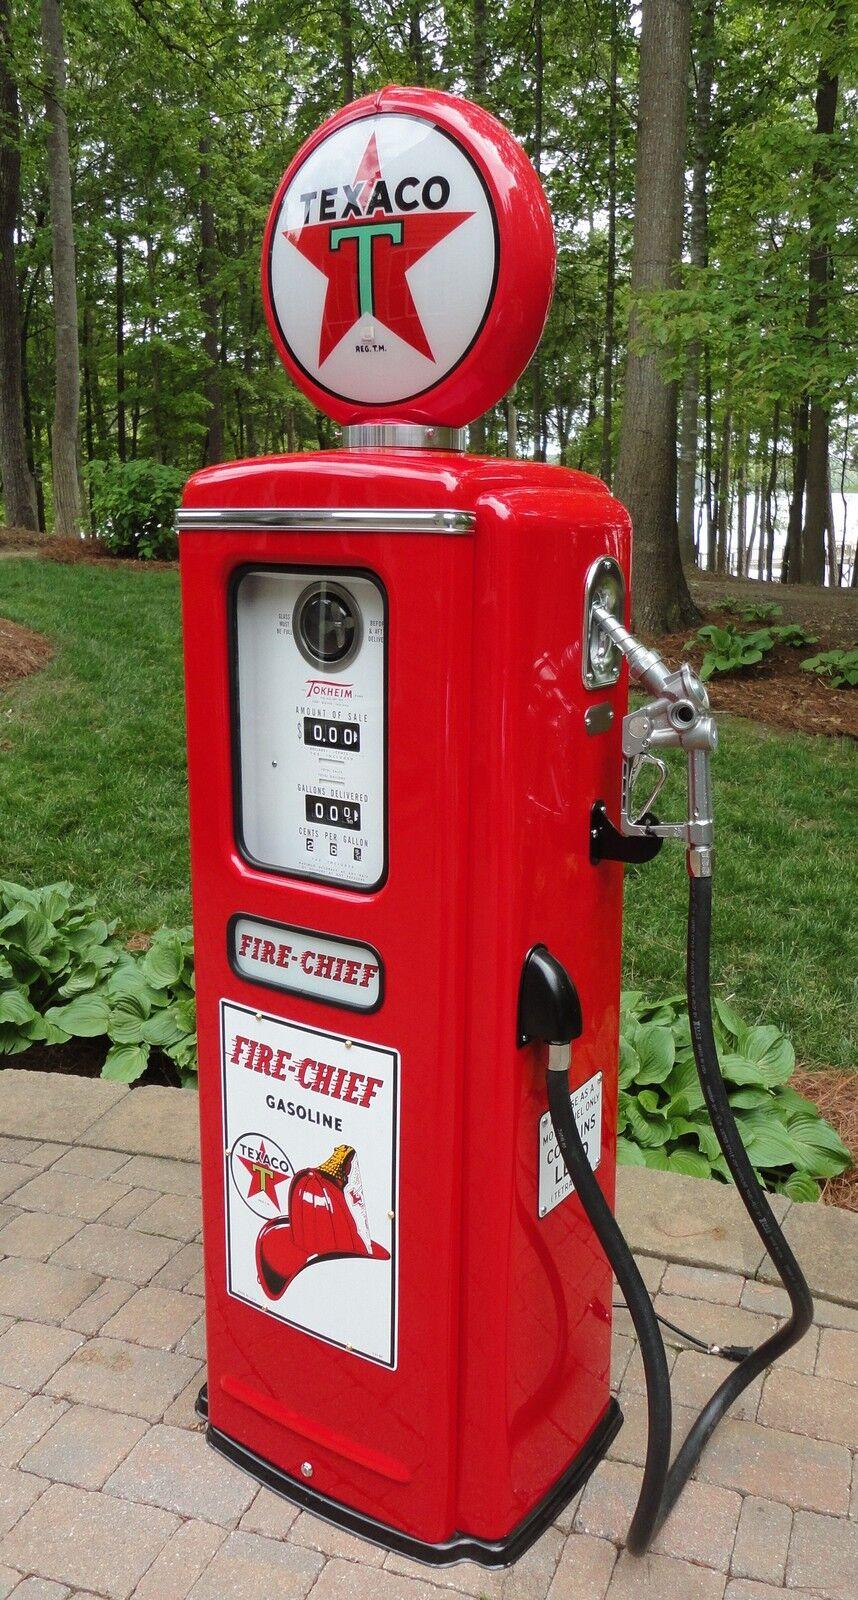 texaco fire chief model 39 tokheim full size gas pump